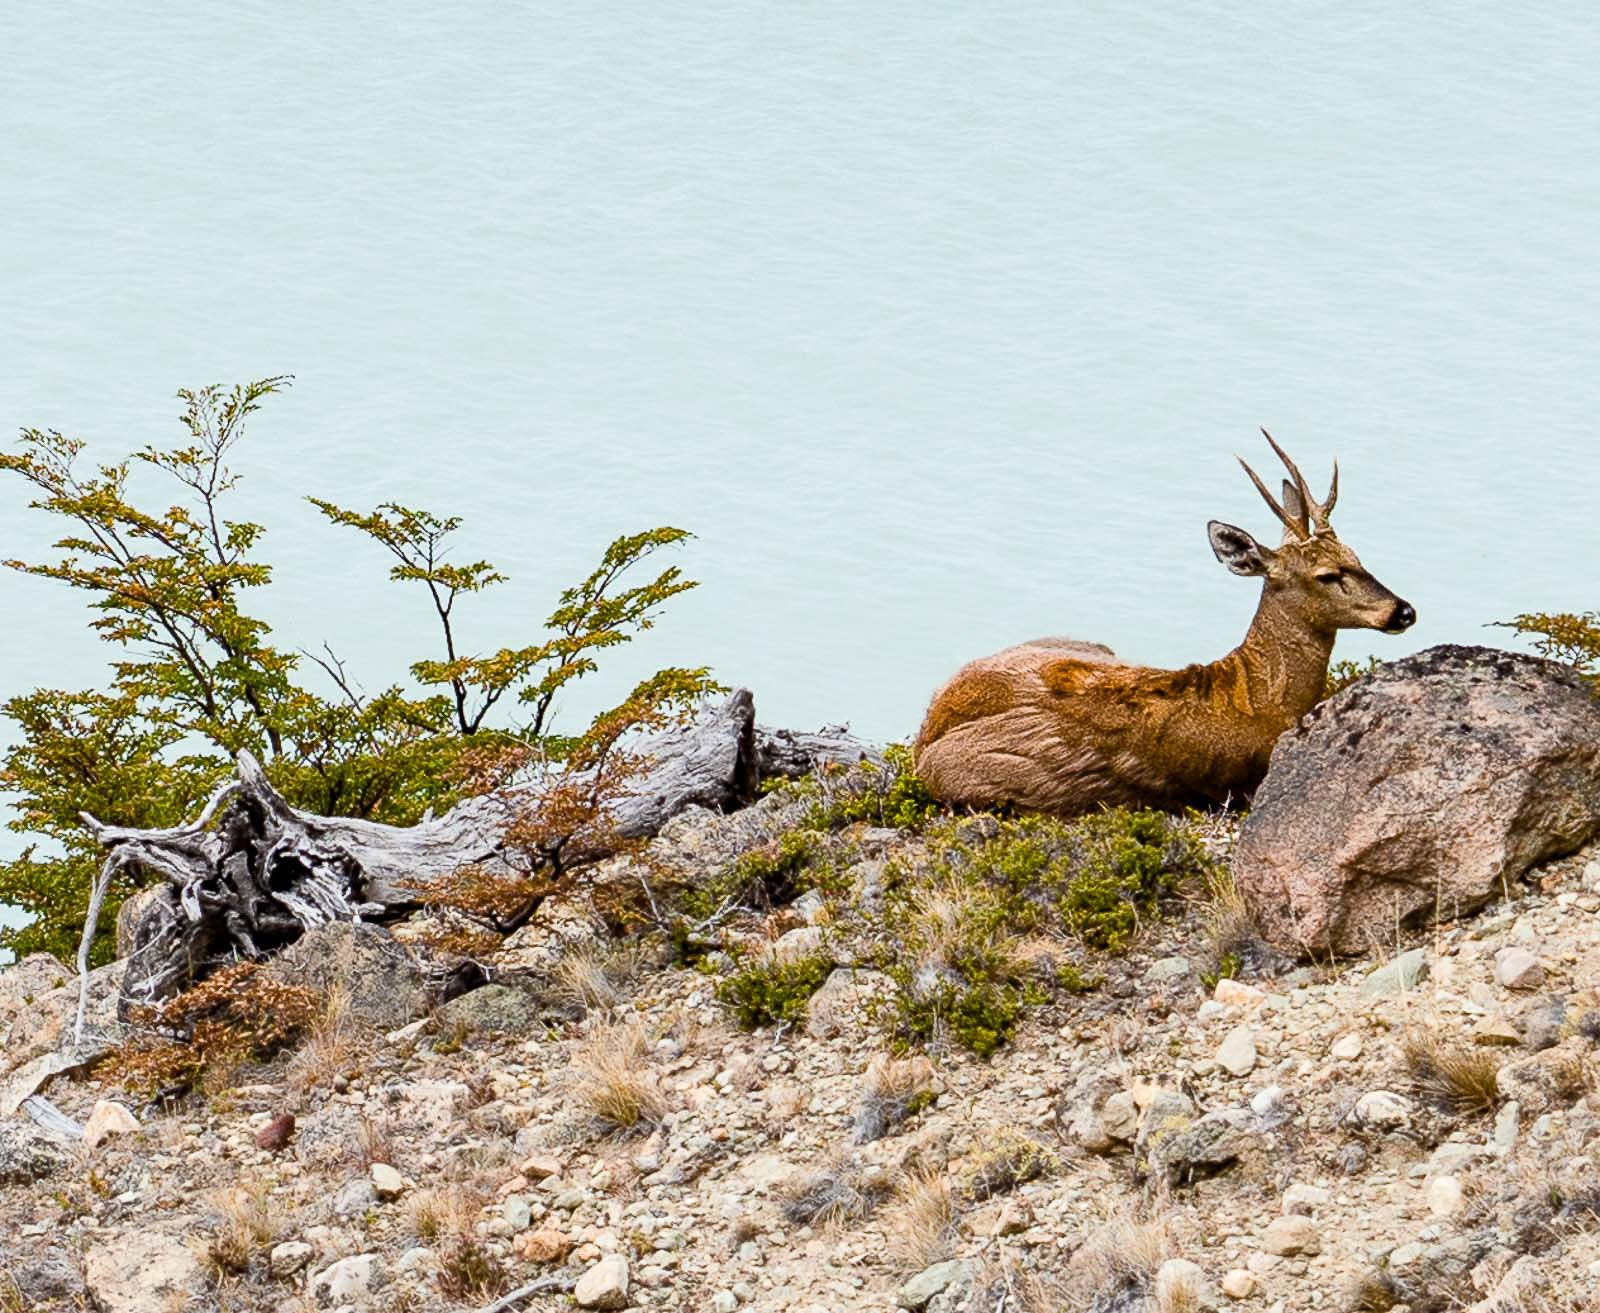 Huemul - Southern Andean Deer Endangered